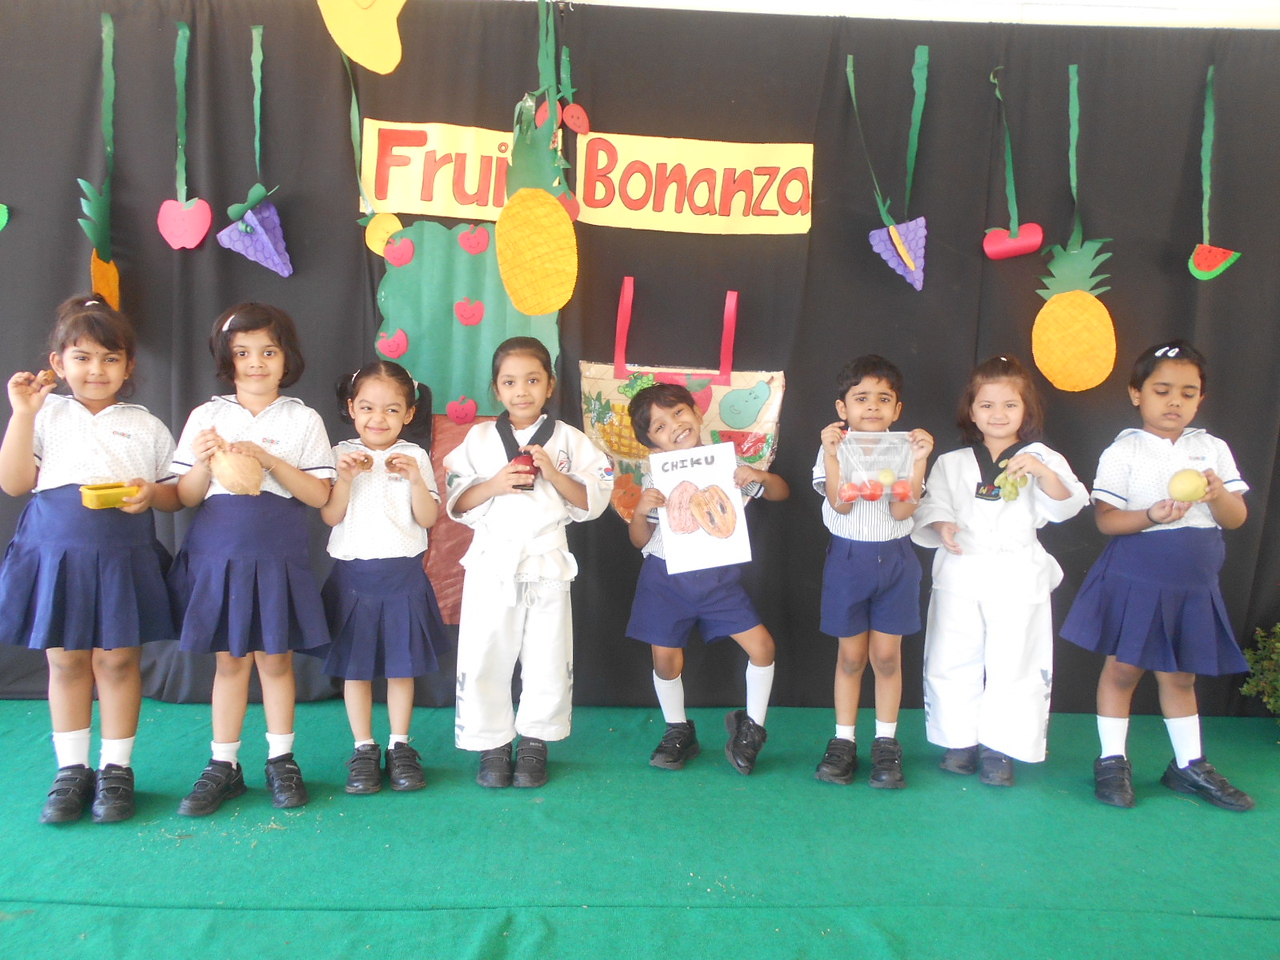 SHOW AND TELL- FRUITS BONANZA